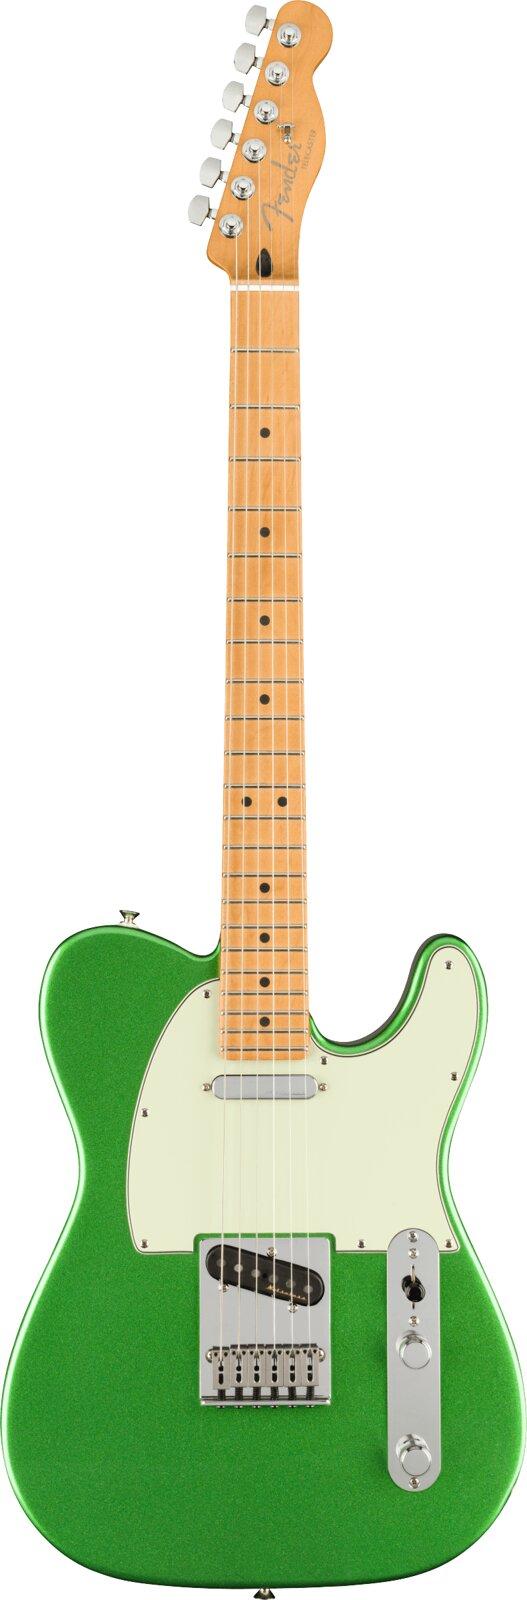 Fender Player Plus Telecaster, Maple Fingerboard, Cosmic Jade : photo 1